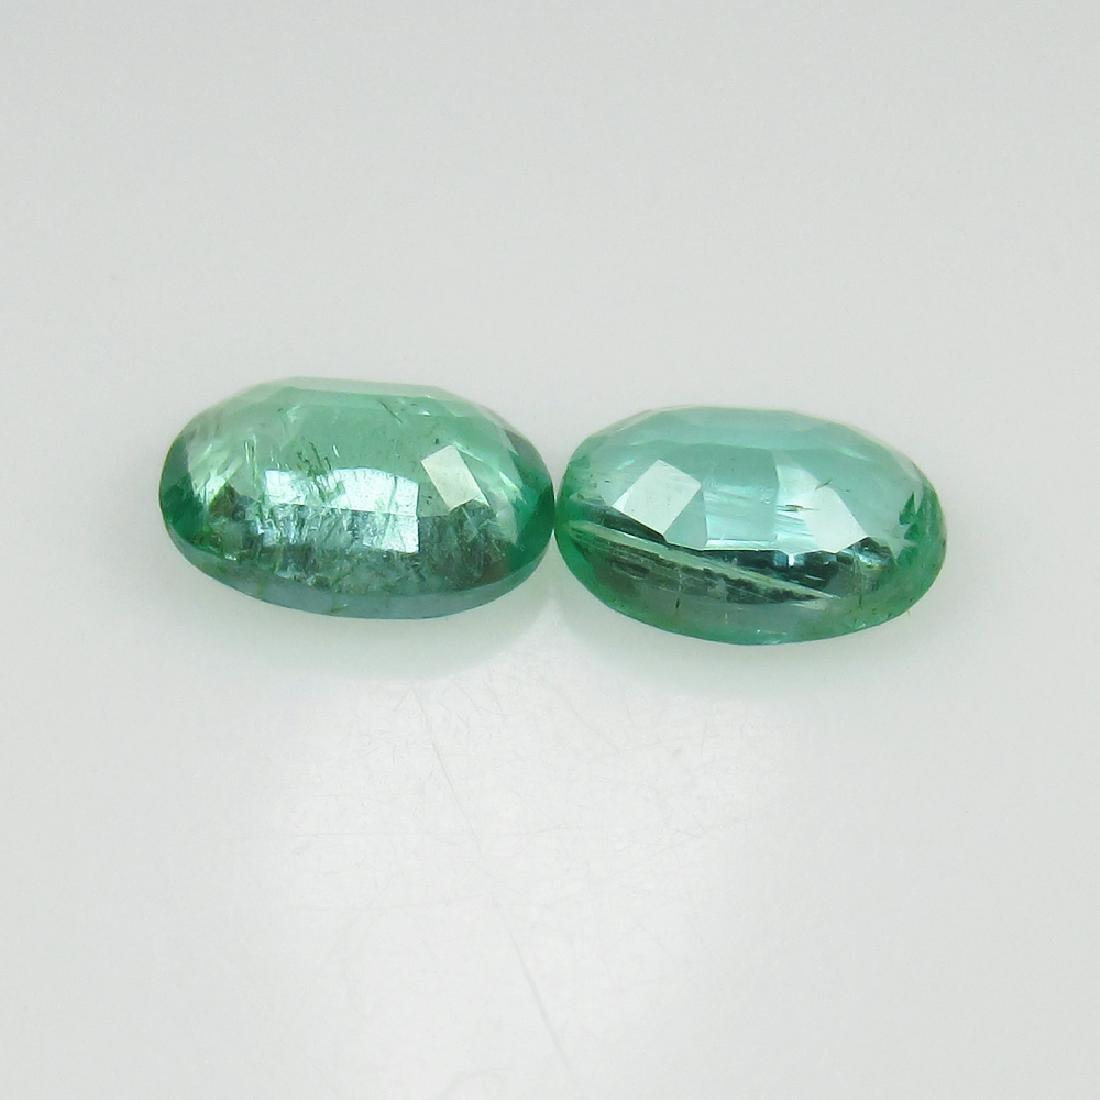 0.92 Ctw Natural Zambian Emerald Matching Oval Pair - 2